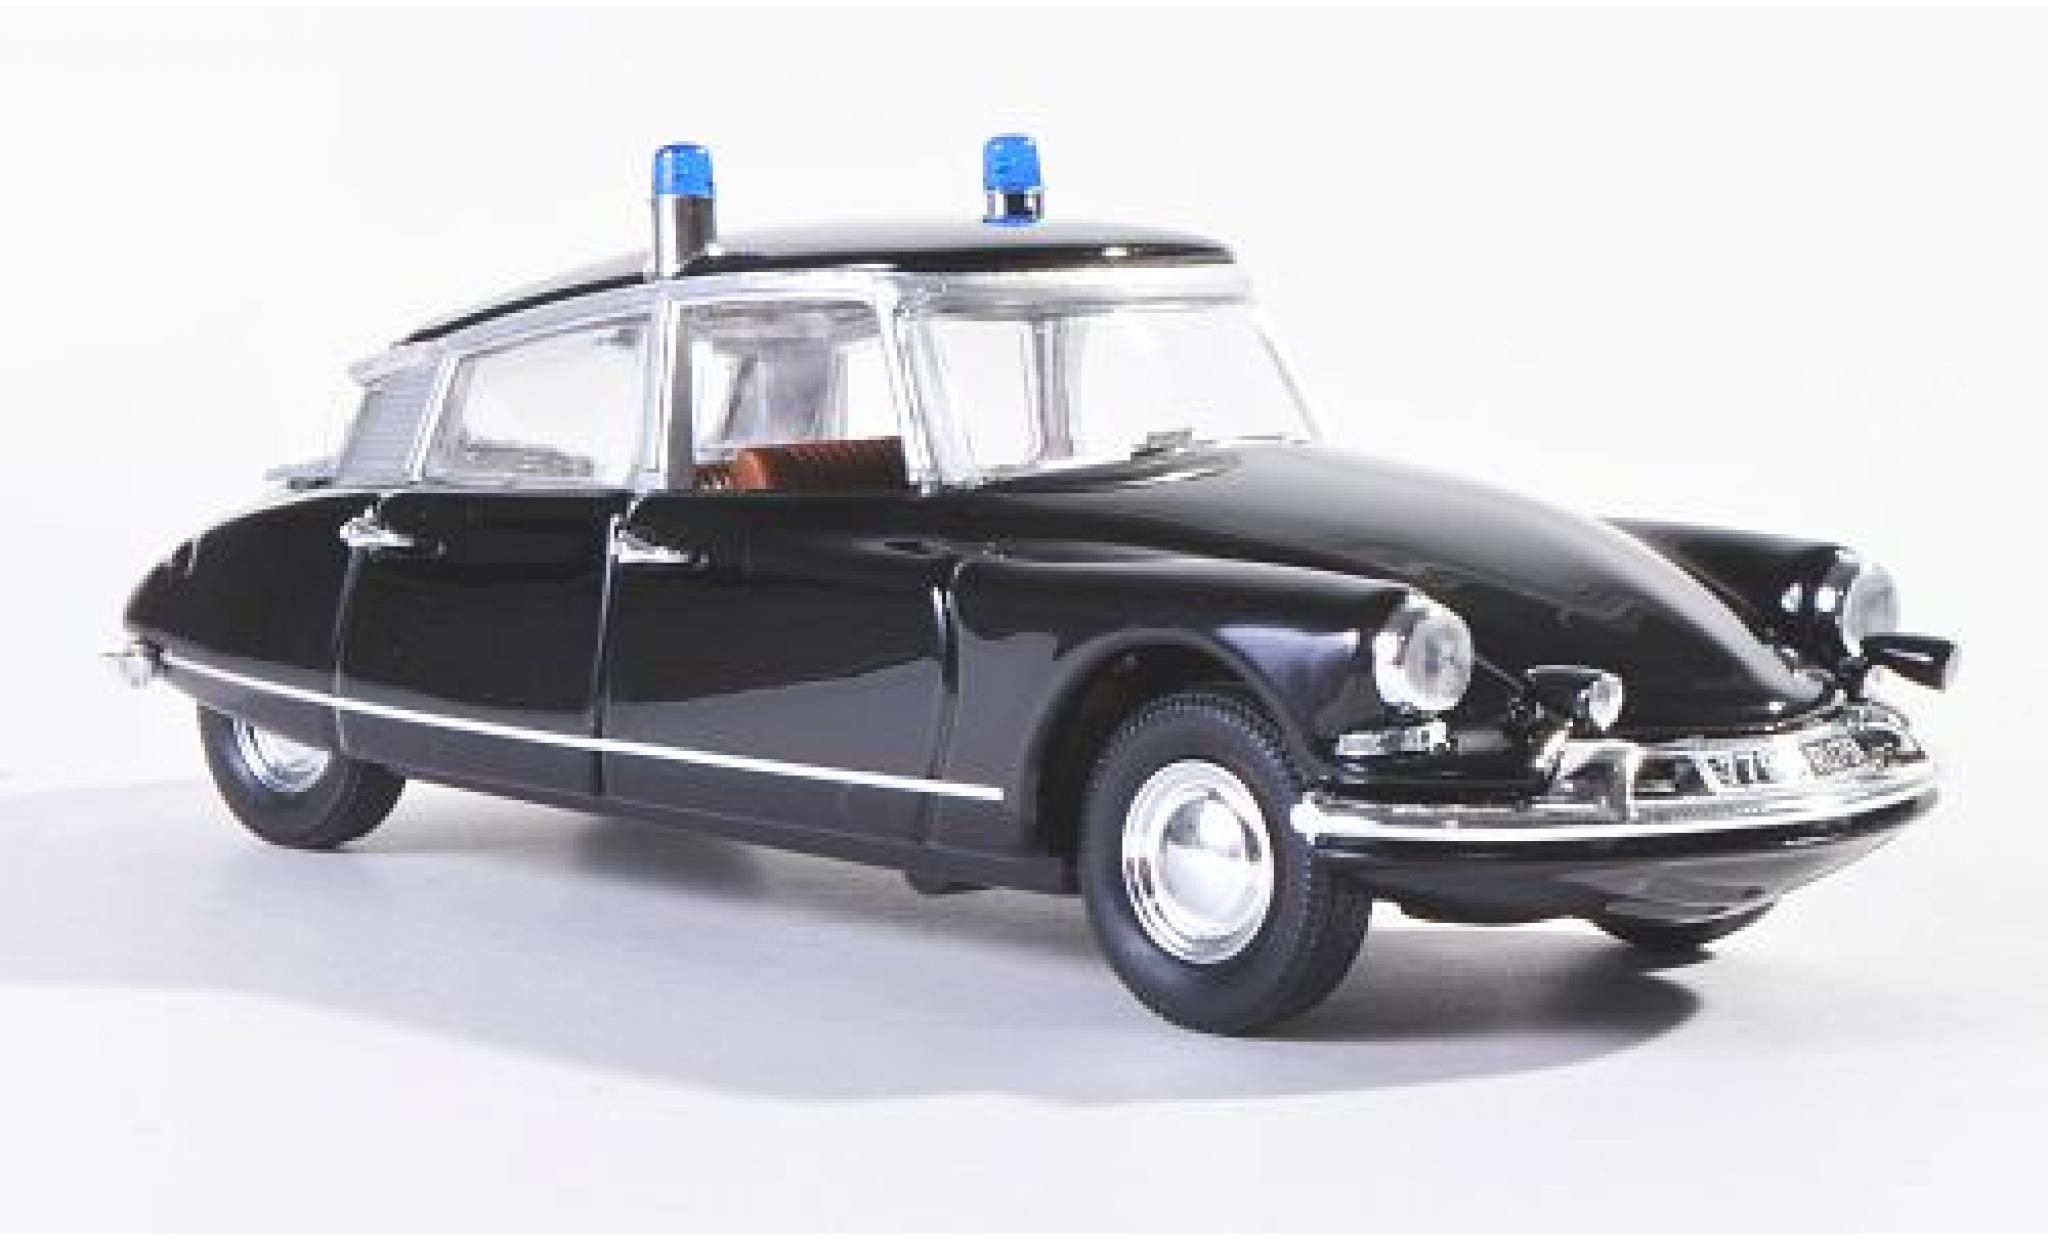 Citroen ID 19 1/43 Rio Polizia Paris 1968 police (F)